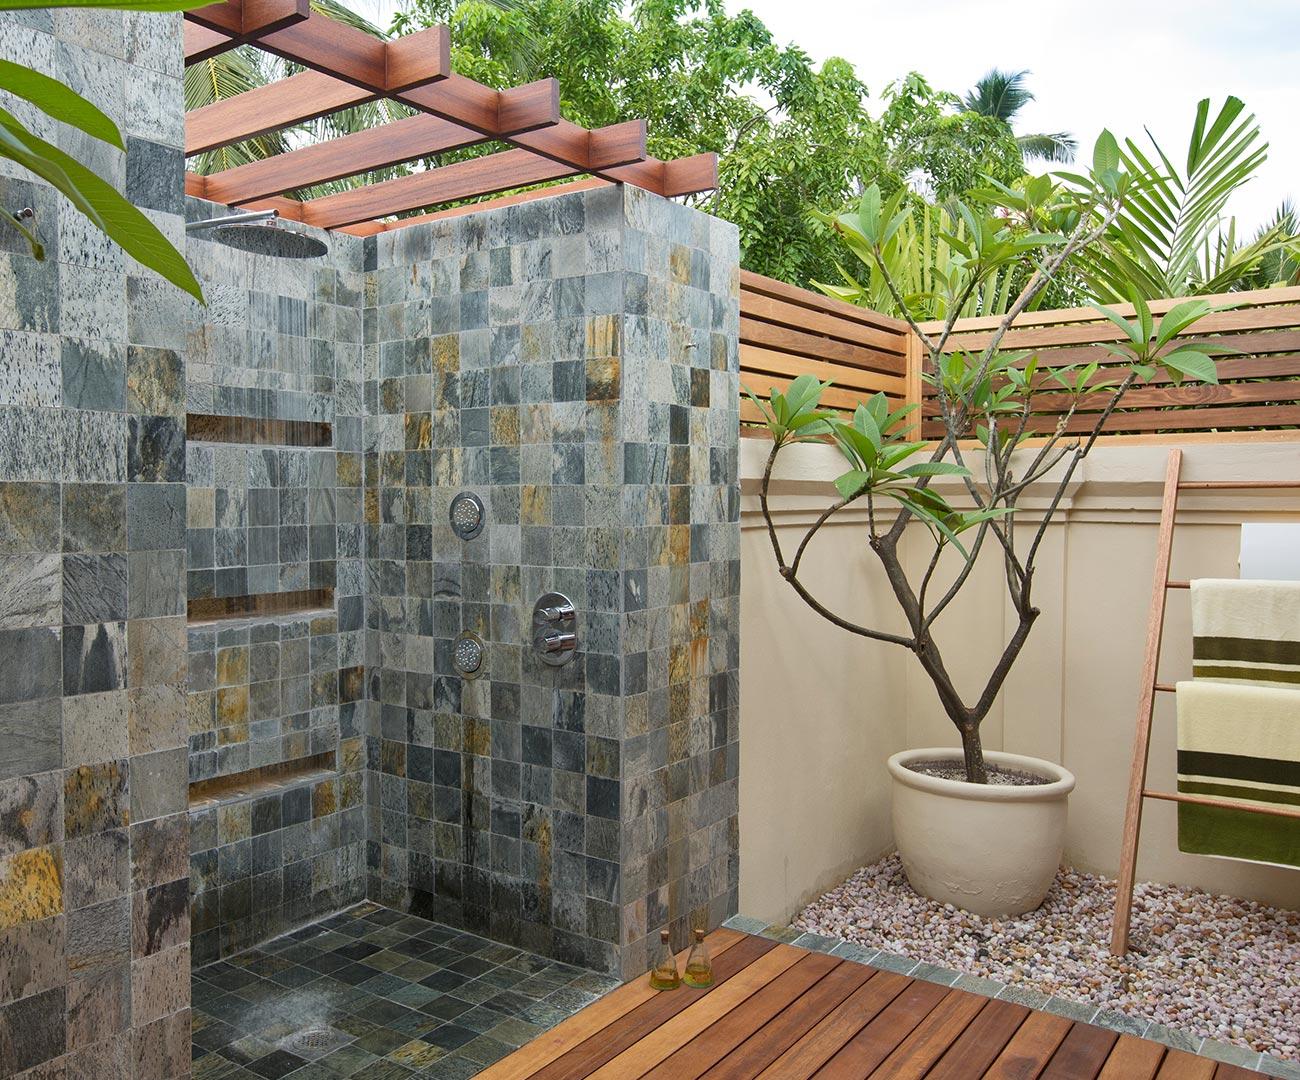 Kurumba Maldives - Presidential Pool Villa - Outdoor Shower Image - Maldives Resorts